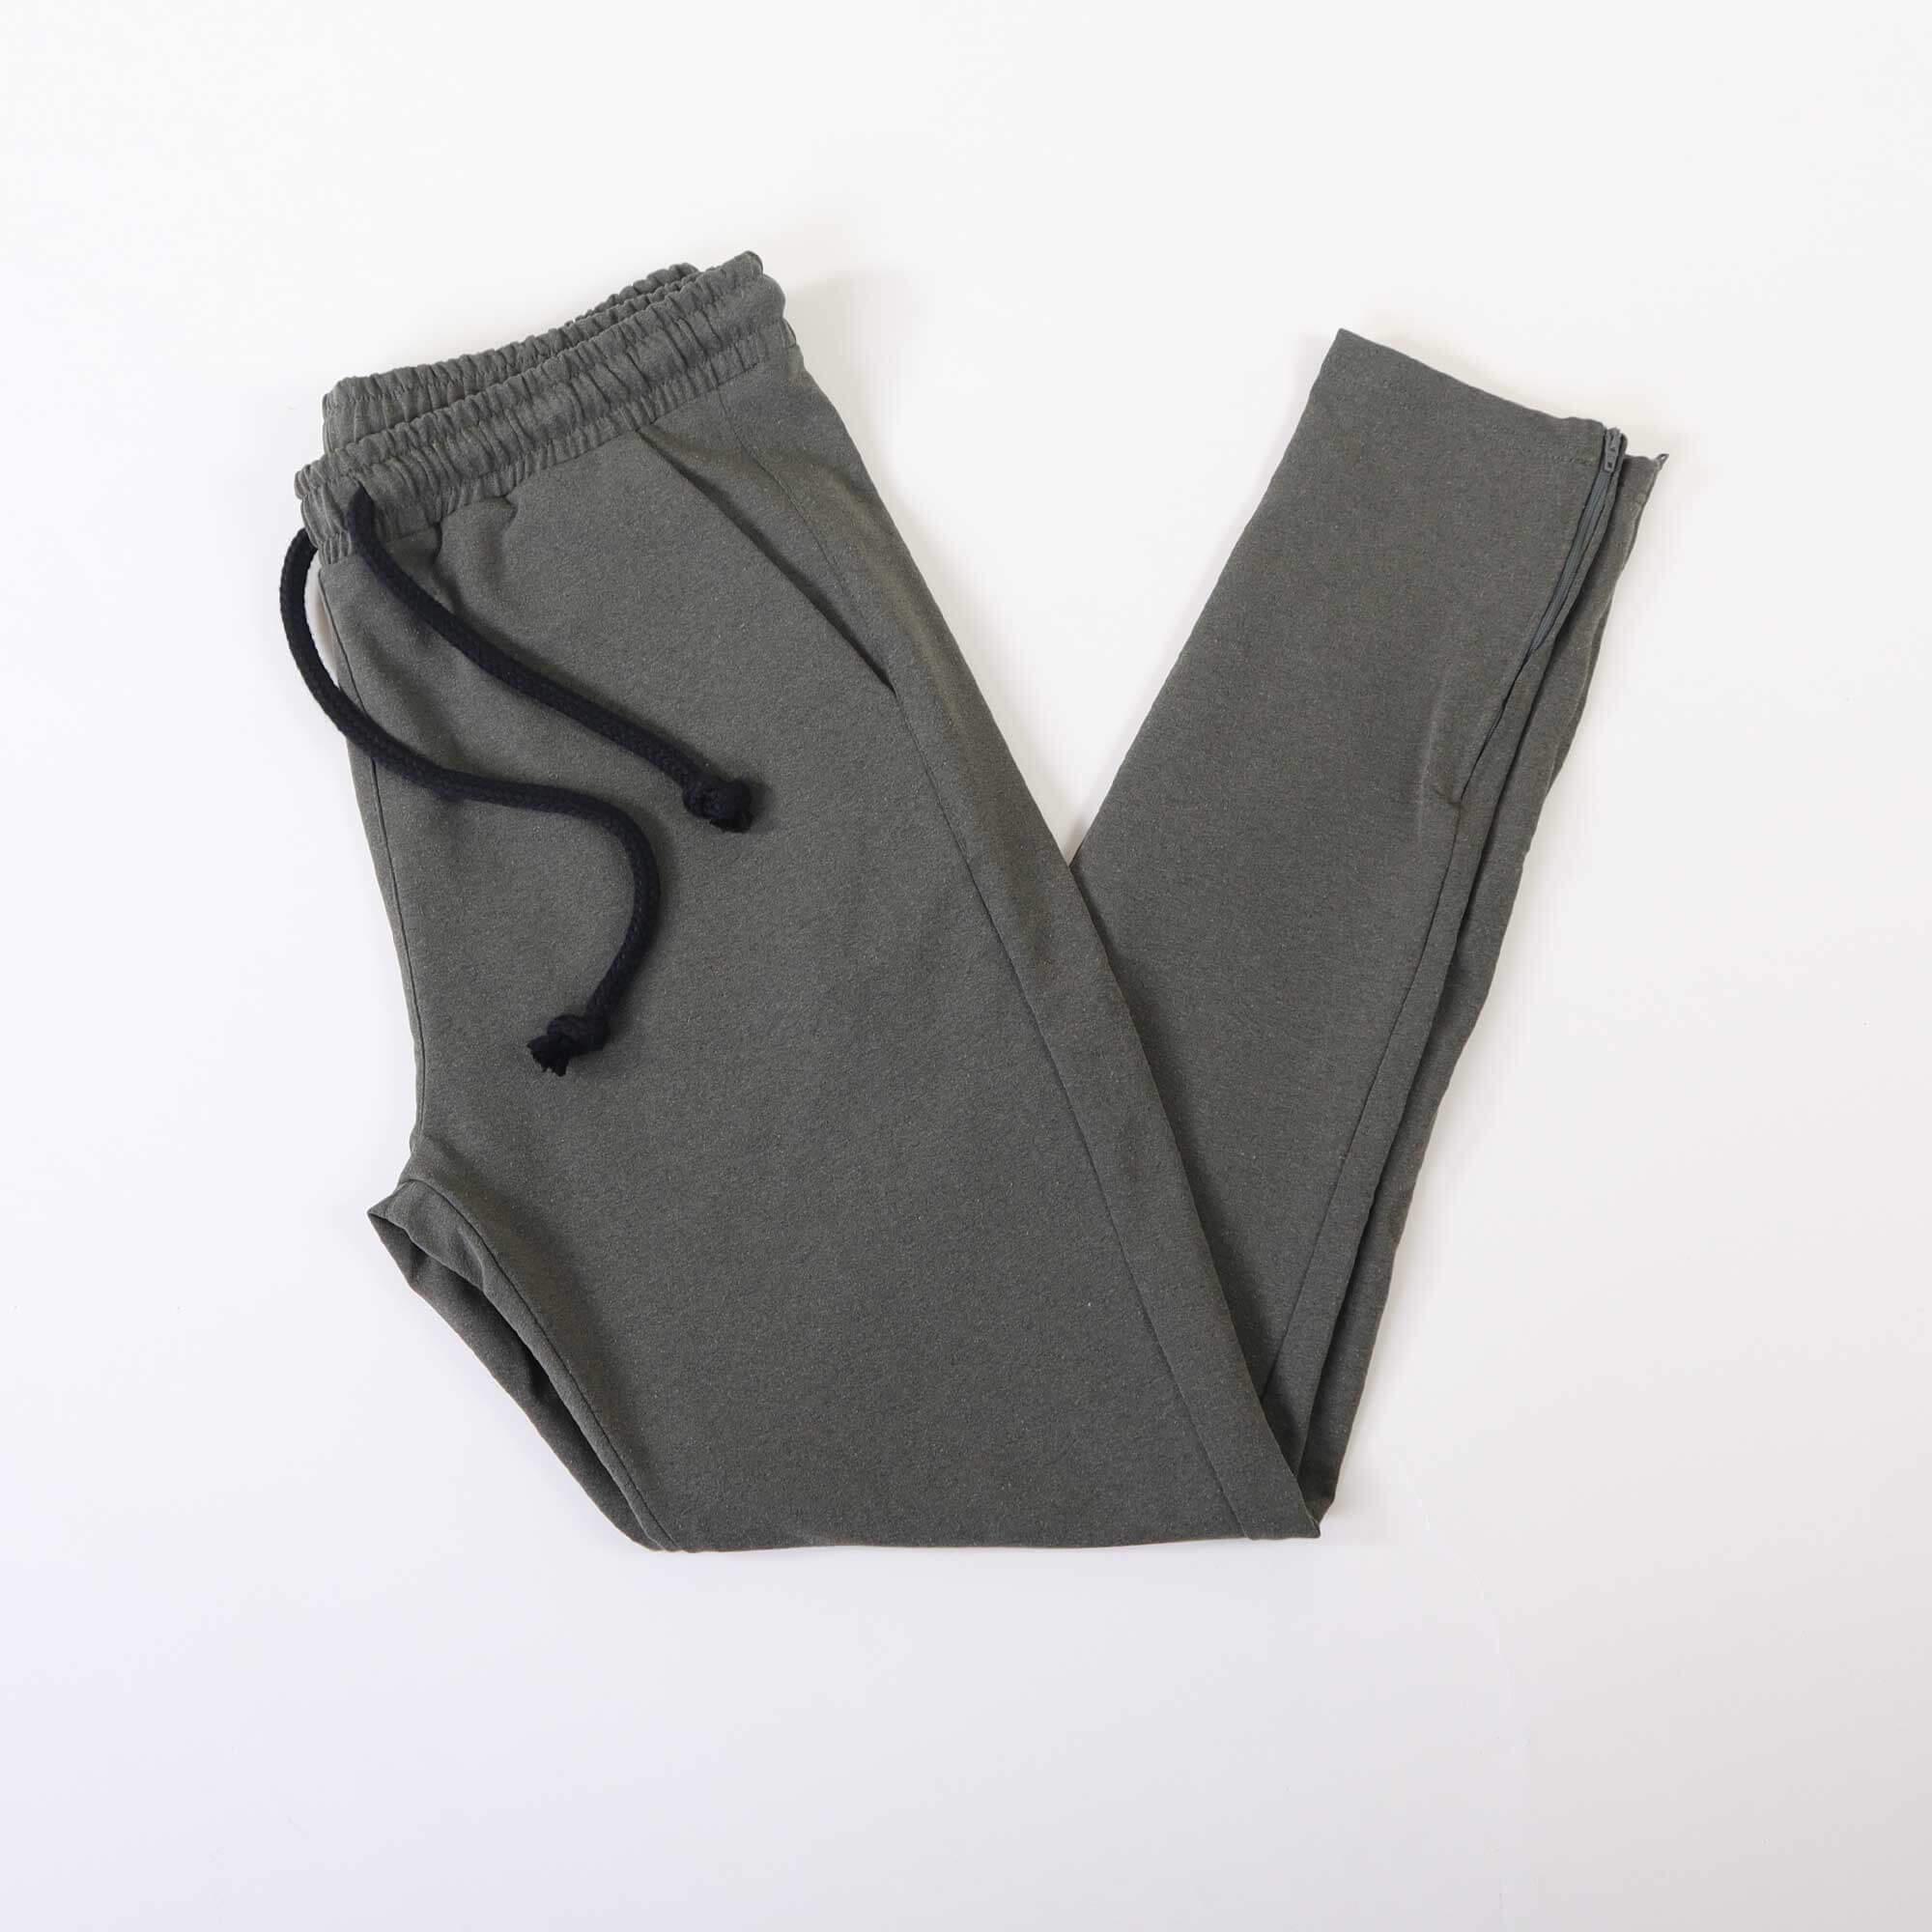 pants-groen-55